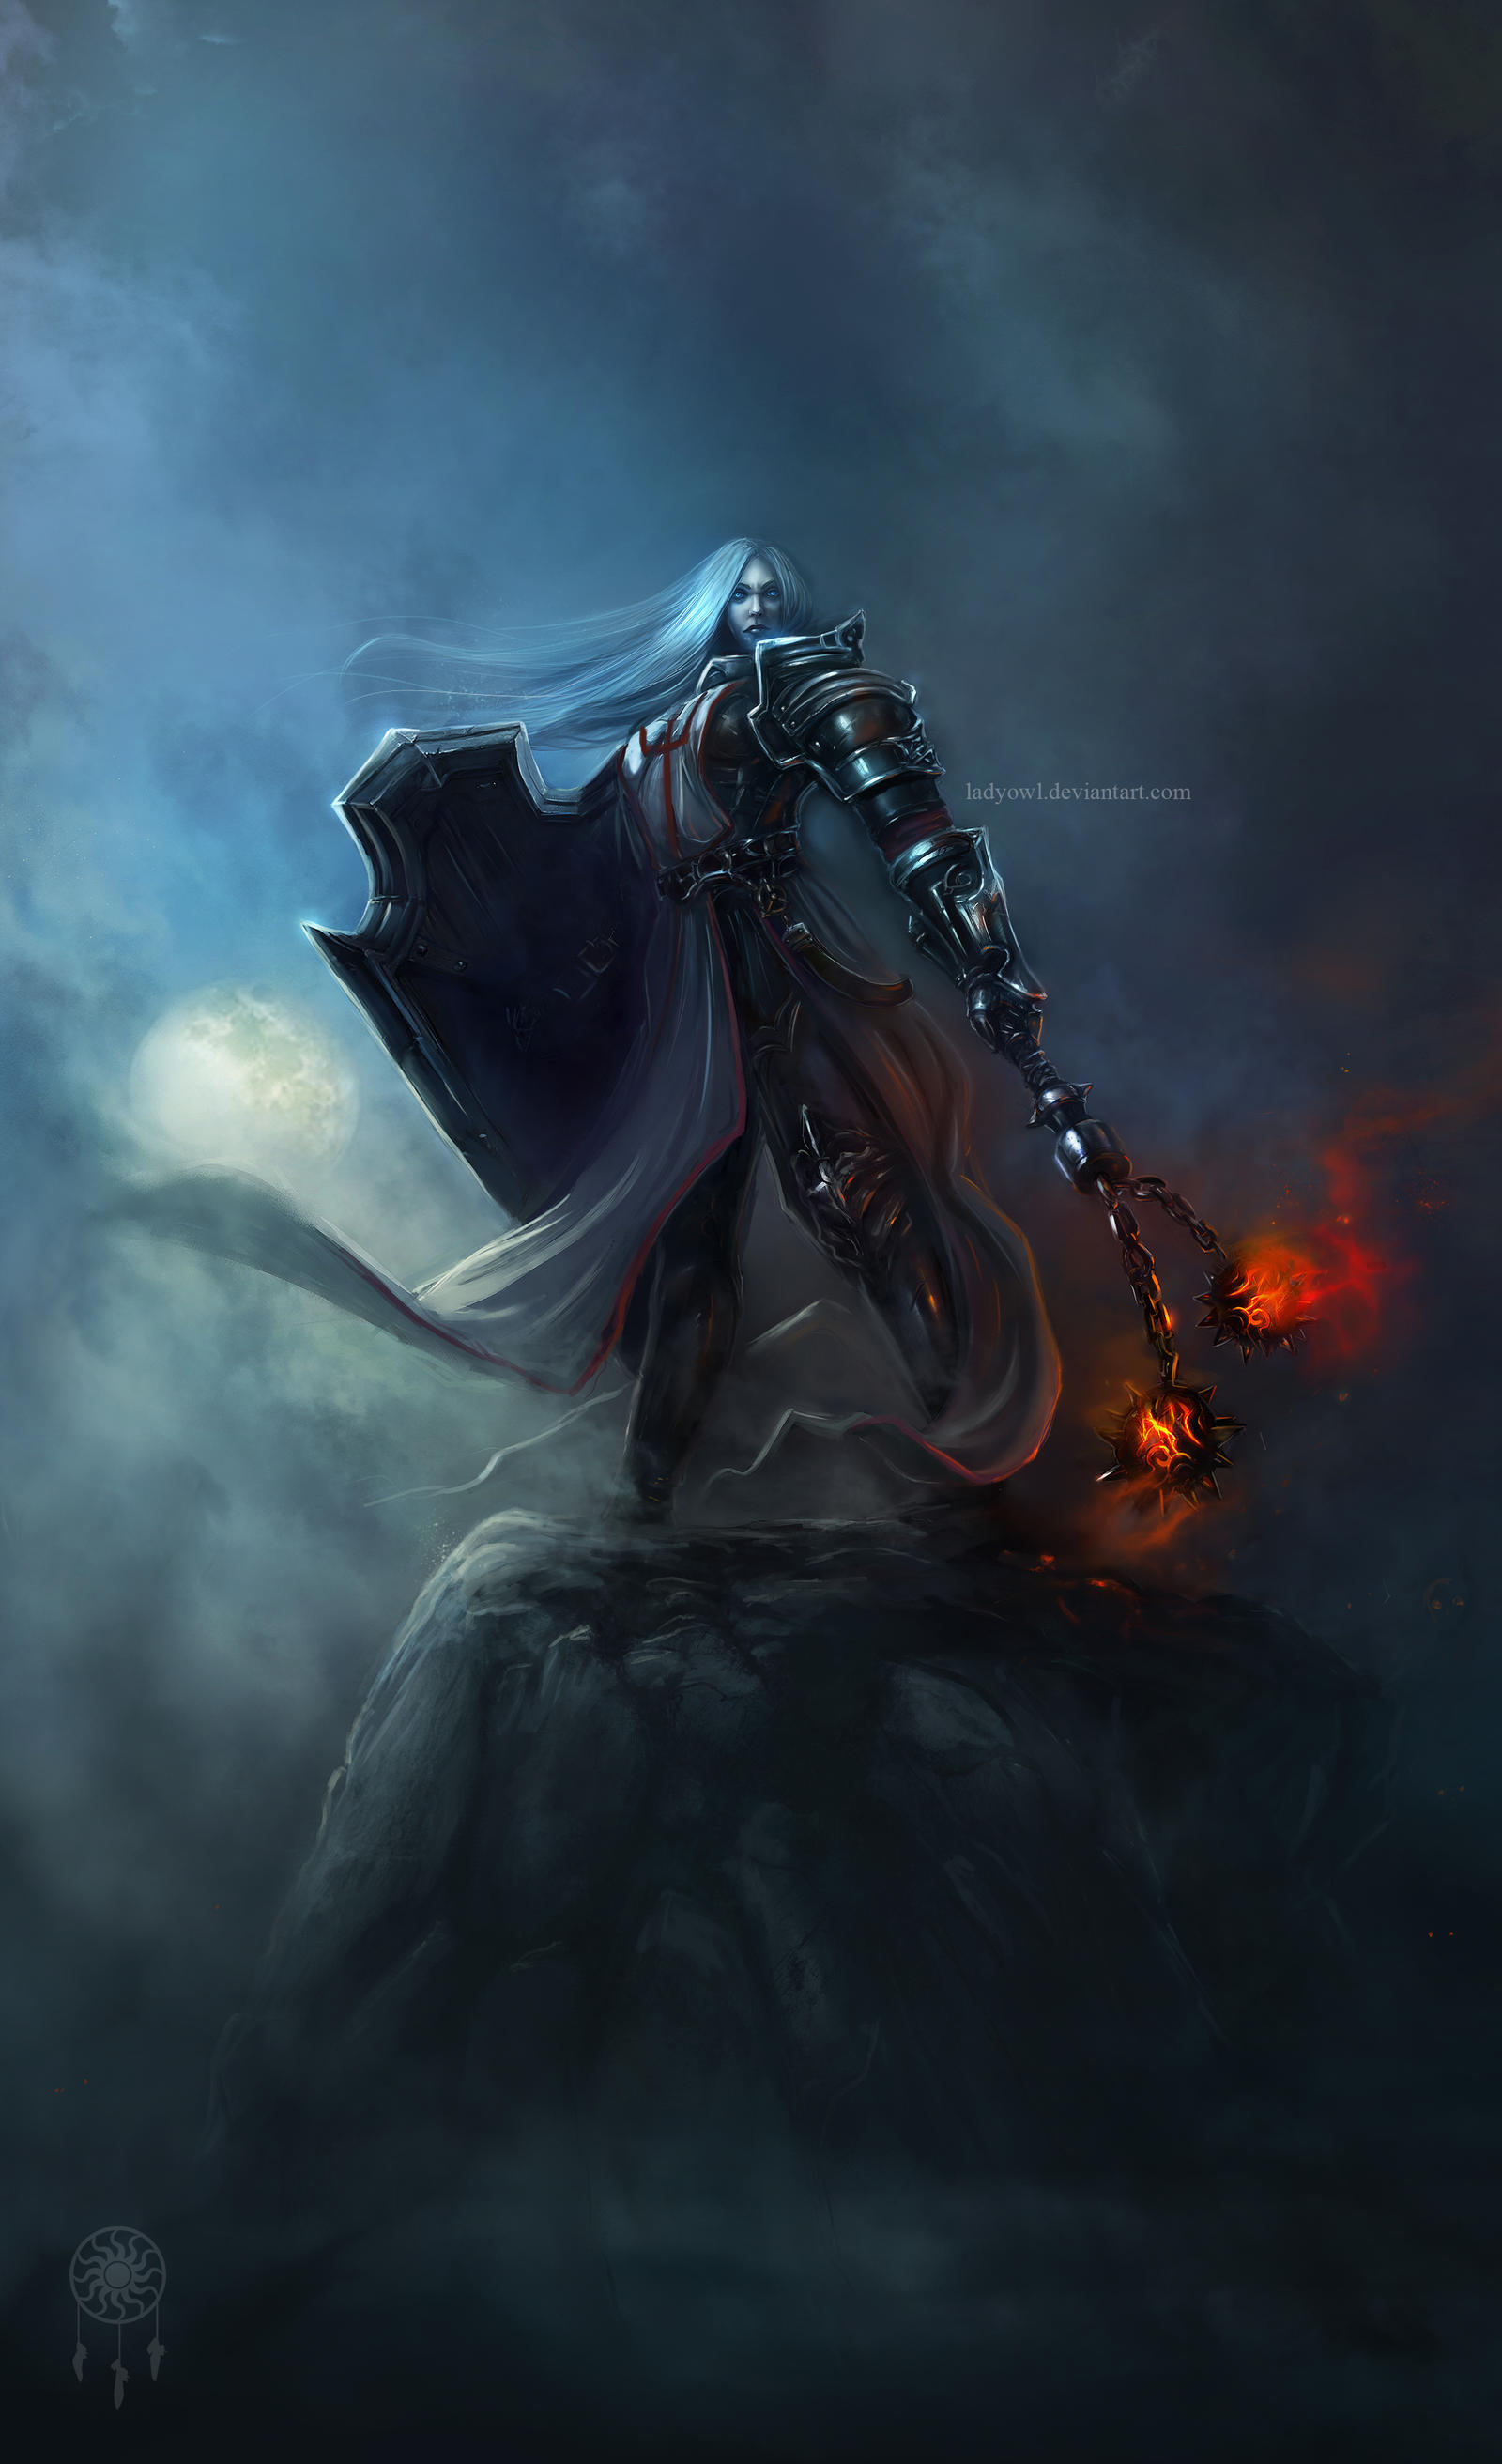 Diablo3-Woman-Crusader by LadyOwl